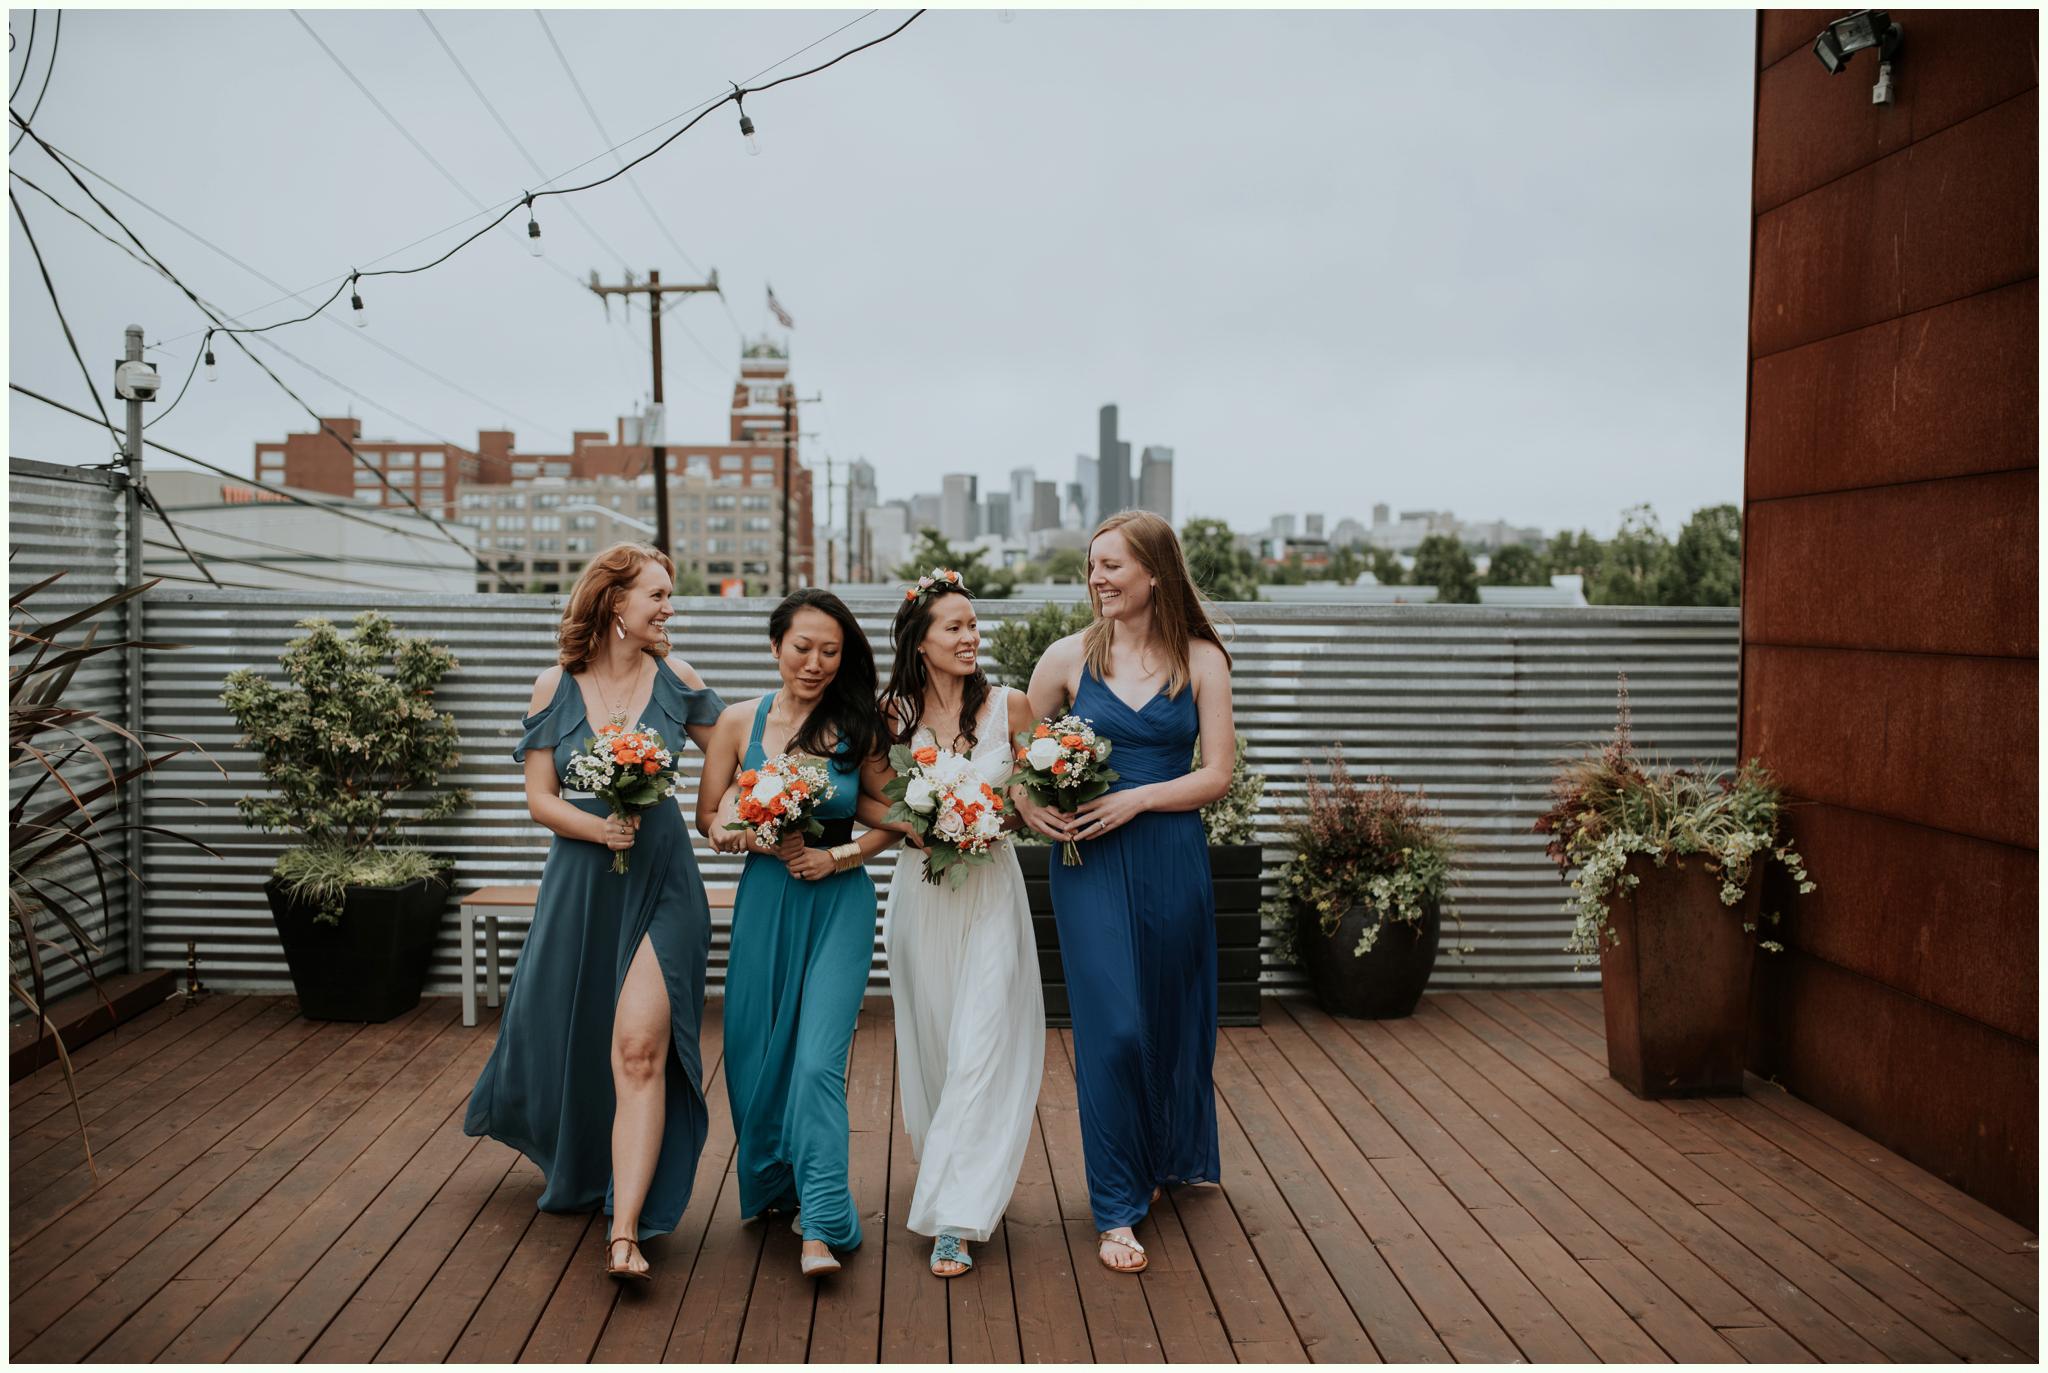 within-sodo-june-wedding-seattle-photographer-caitlyn-nikula-49.jpg